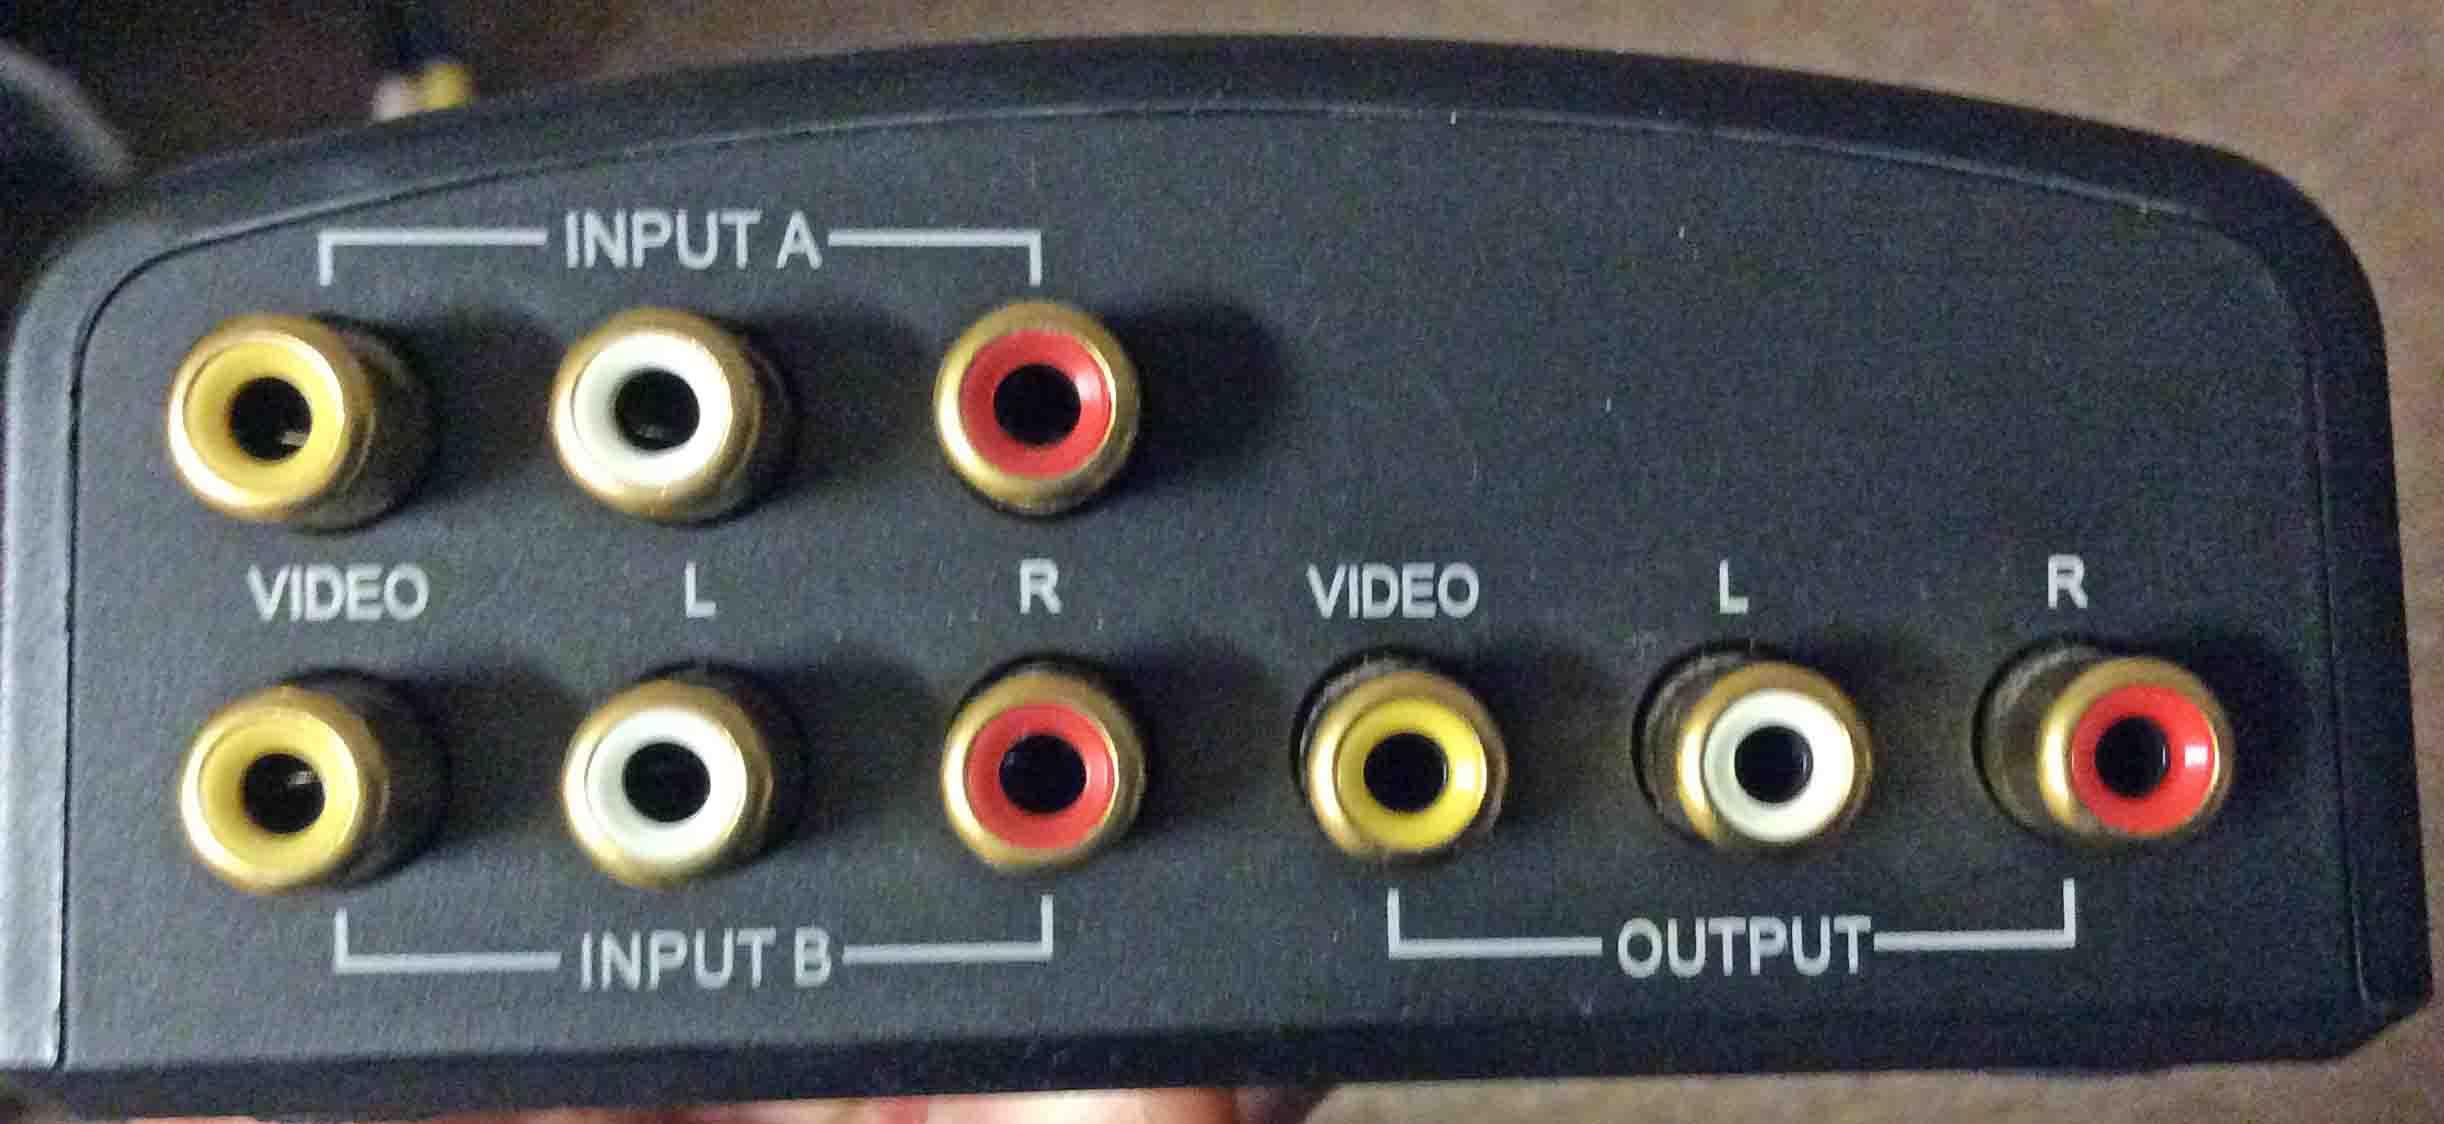 Simple Speaker Selector Switch Questiondpdtforspeakersjpg